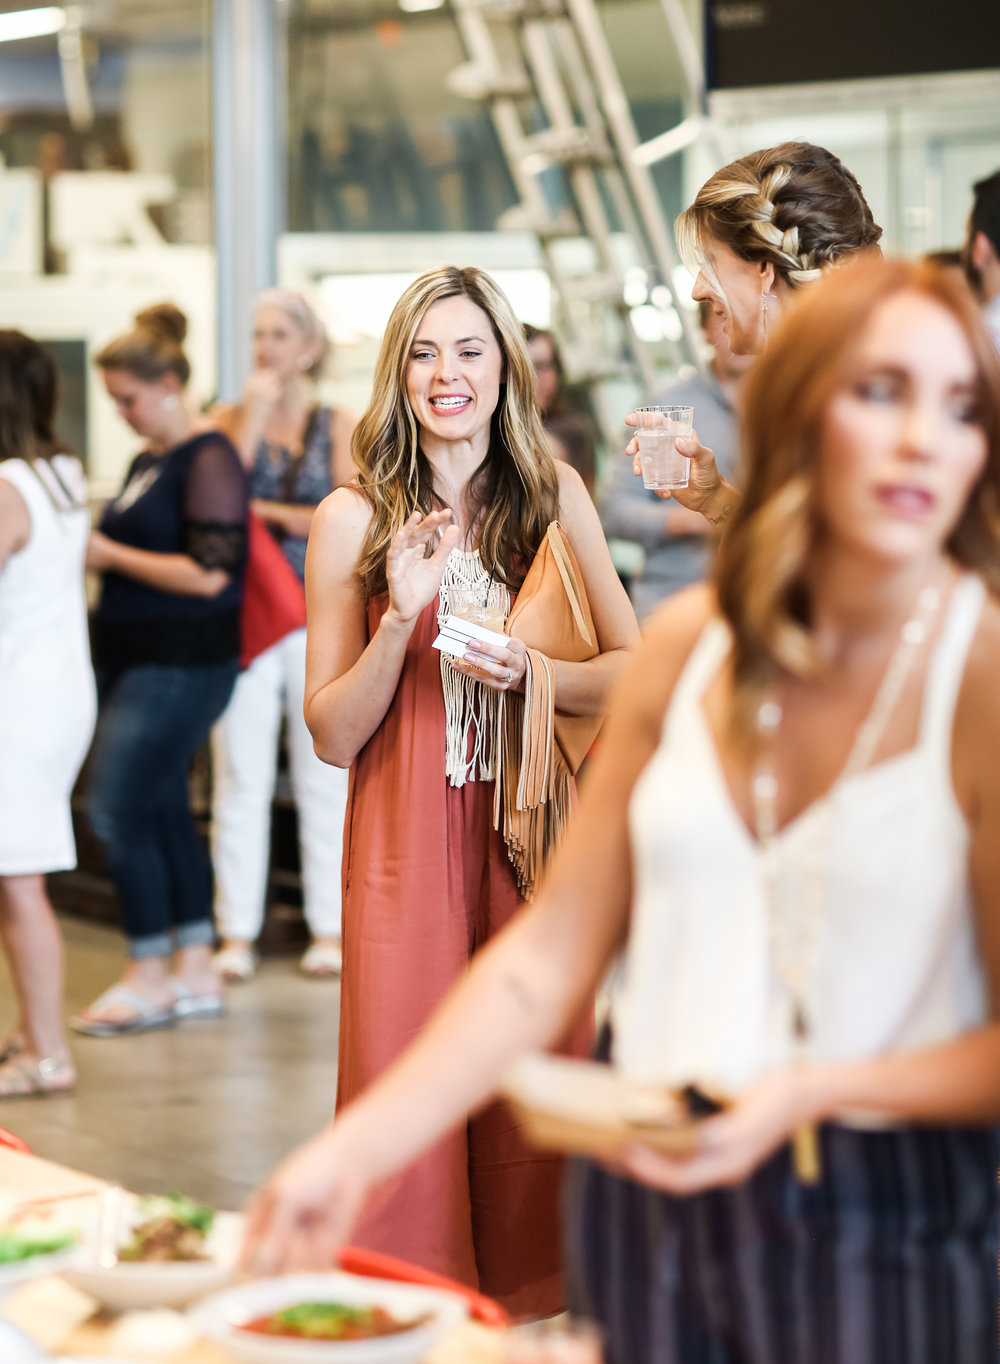 The Ivy Event Phoenix Arizona Creative Community Event 37.jpg